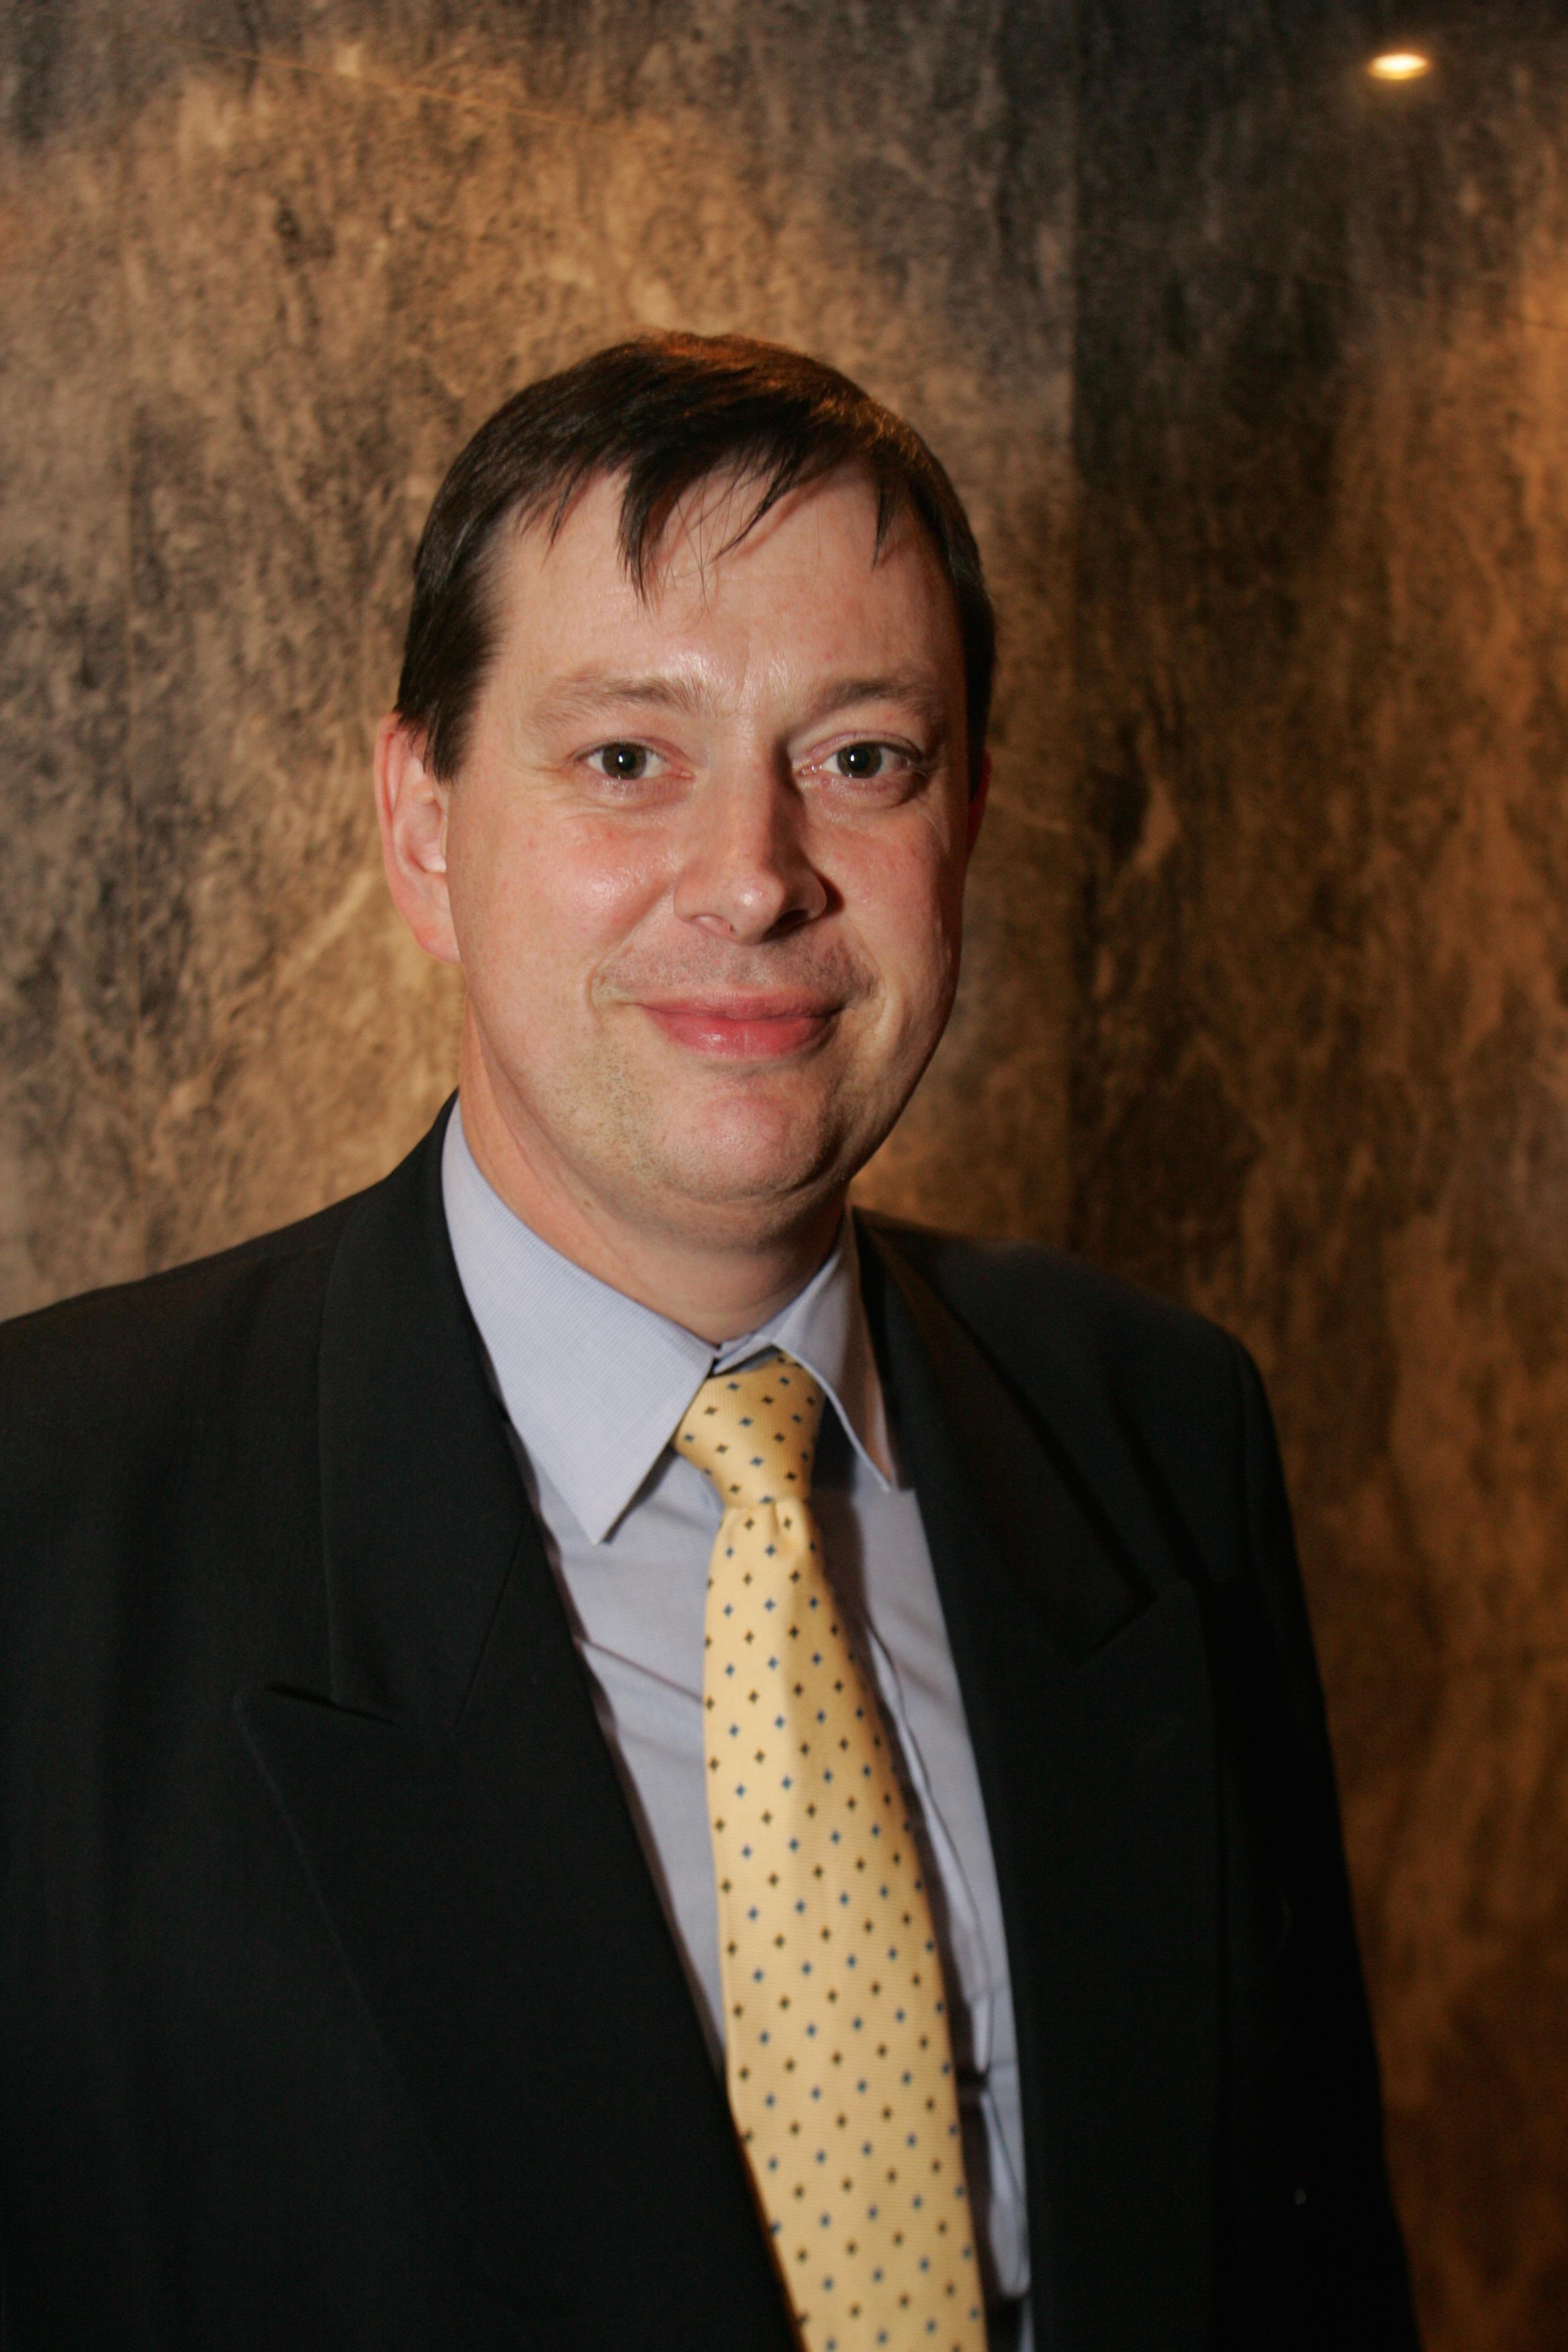 Andrew Green Net Worth